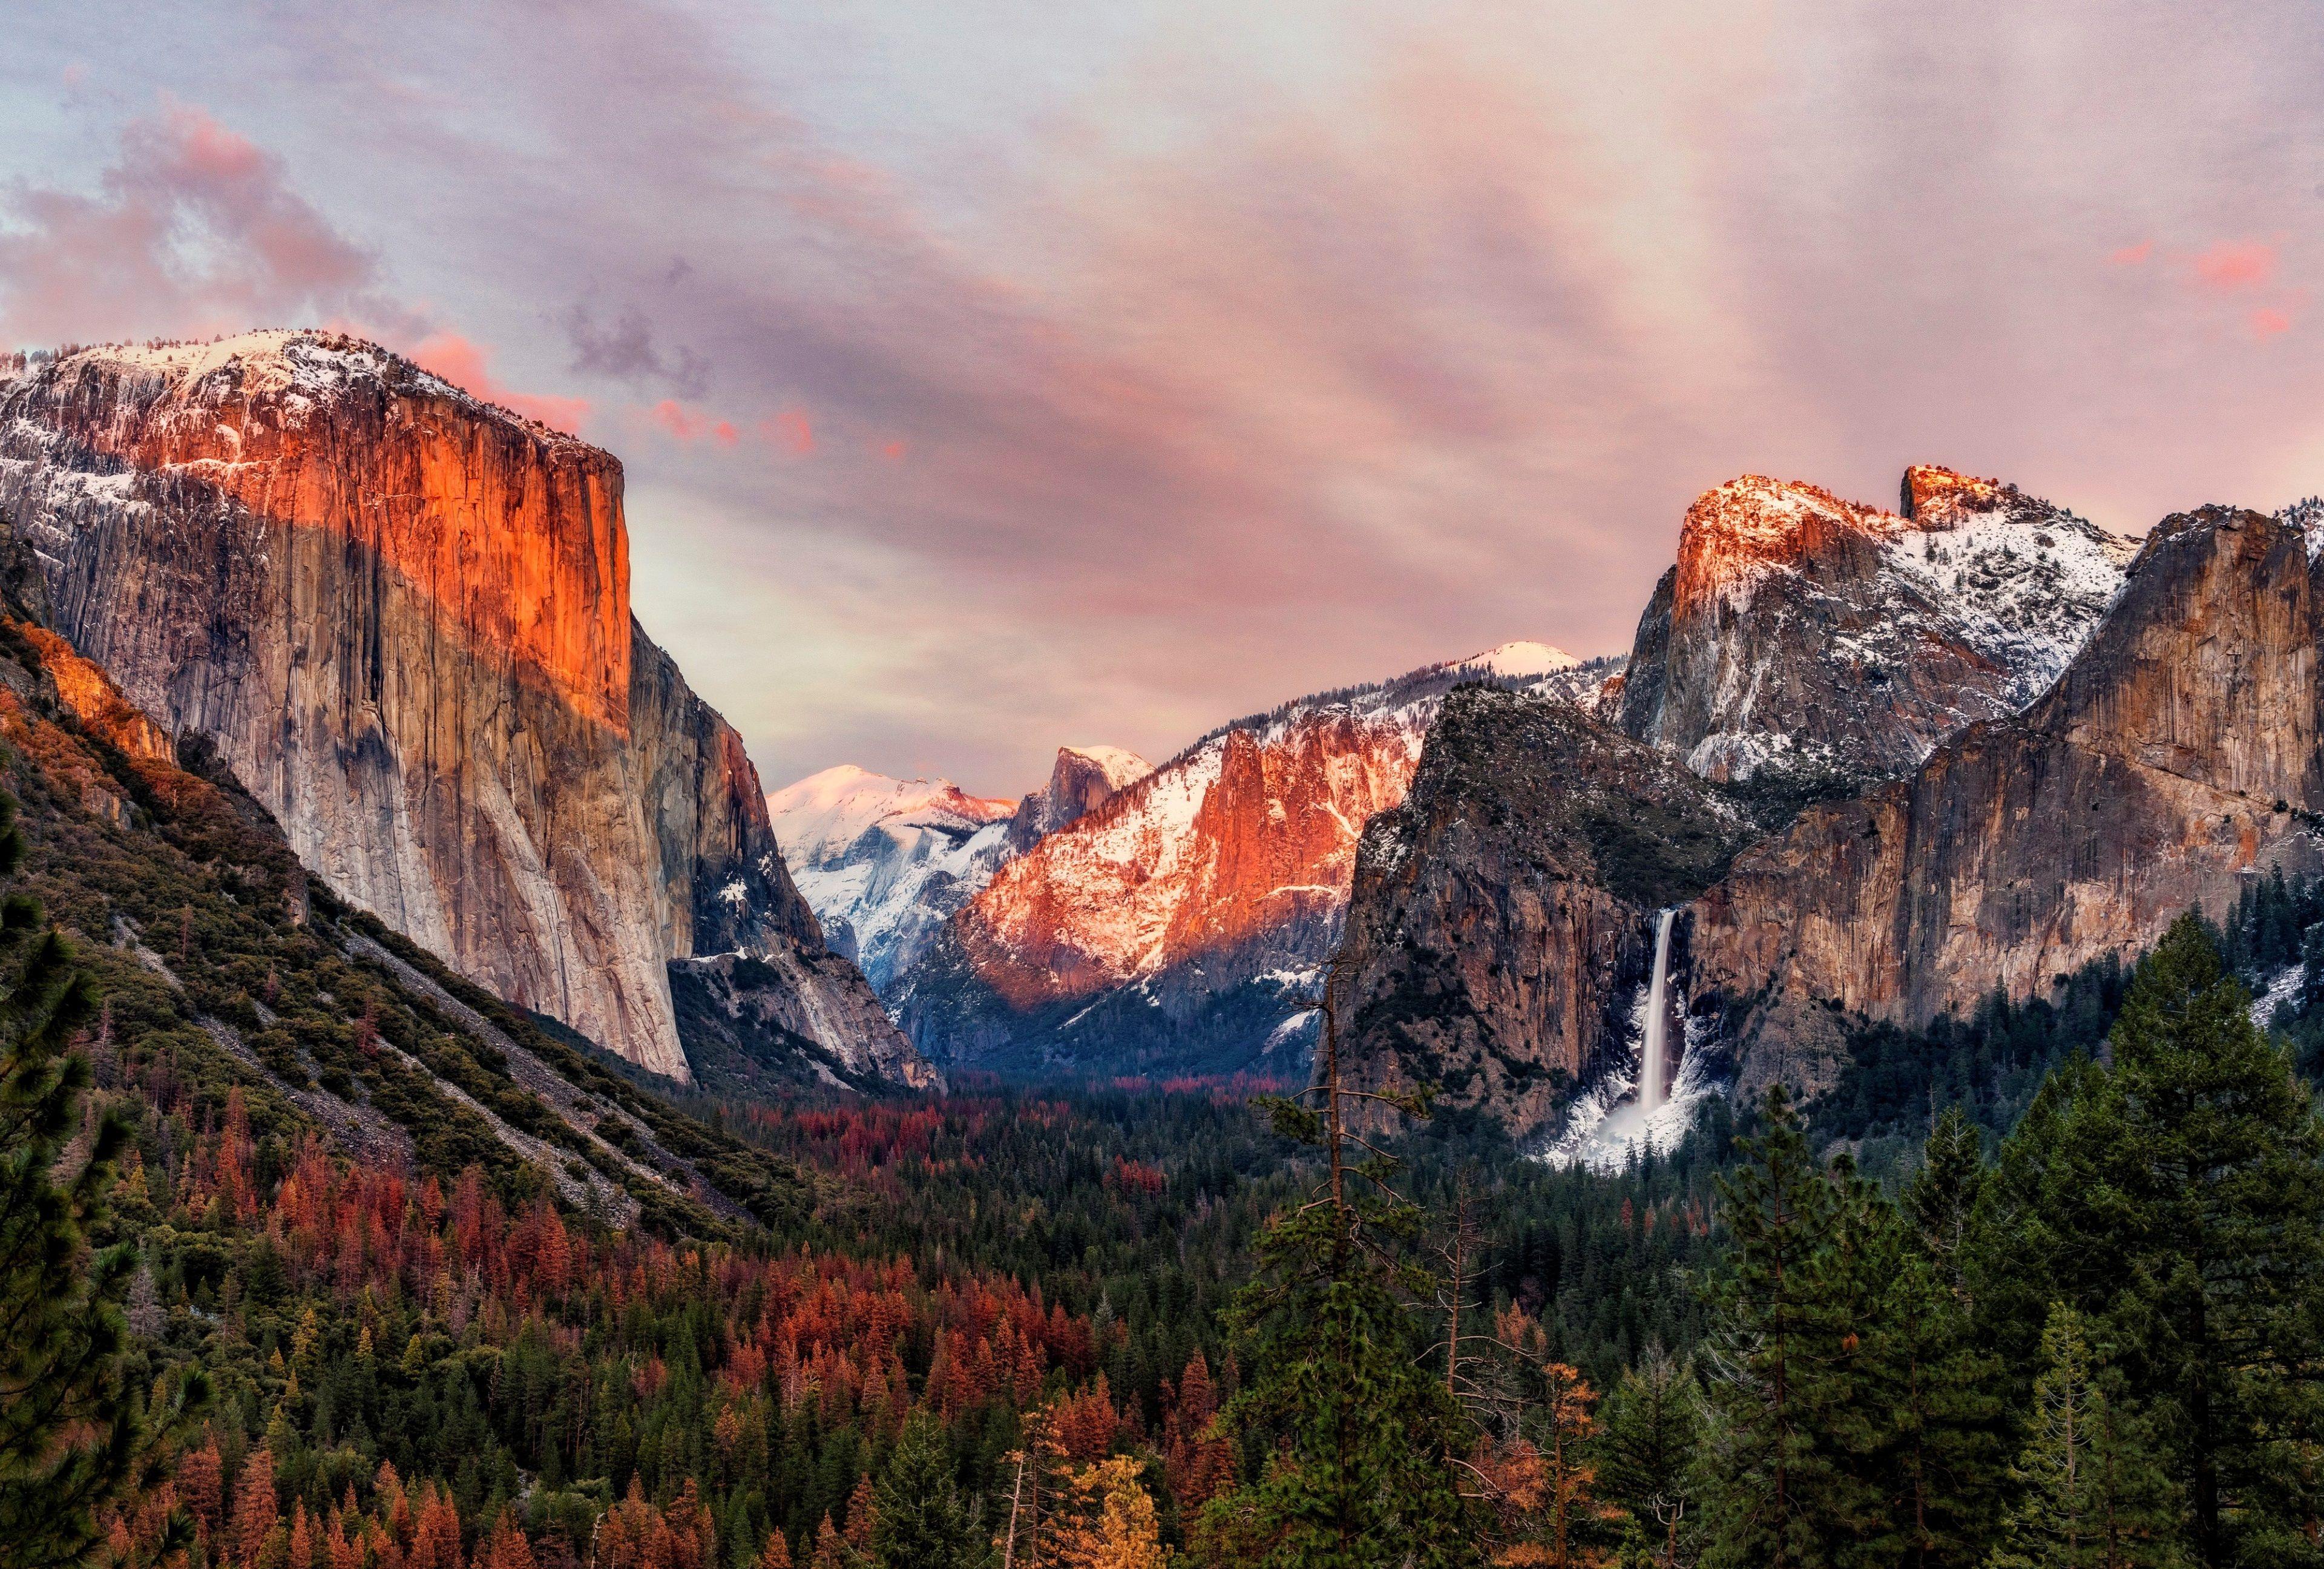 3840x2592 Yosemite National Park 4k Free Download Hd Wallpaper For Desktop Yosemite Wallpaper Yosemite National Parks